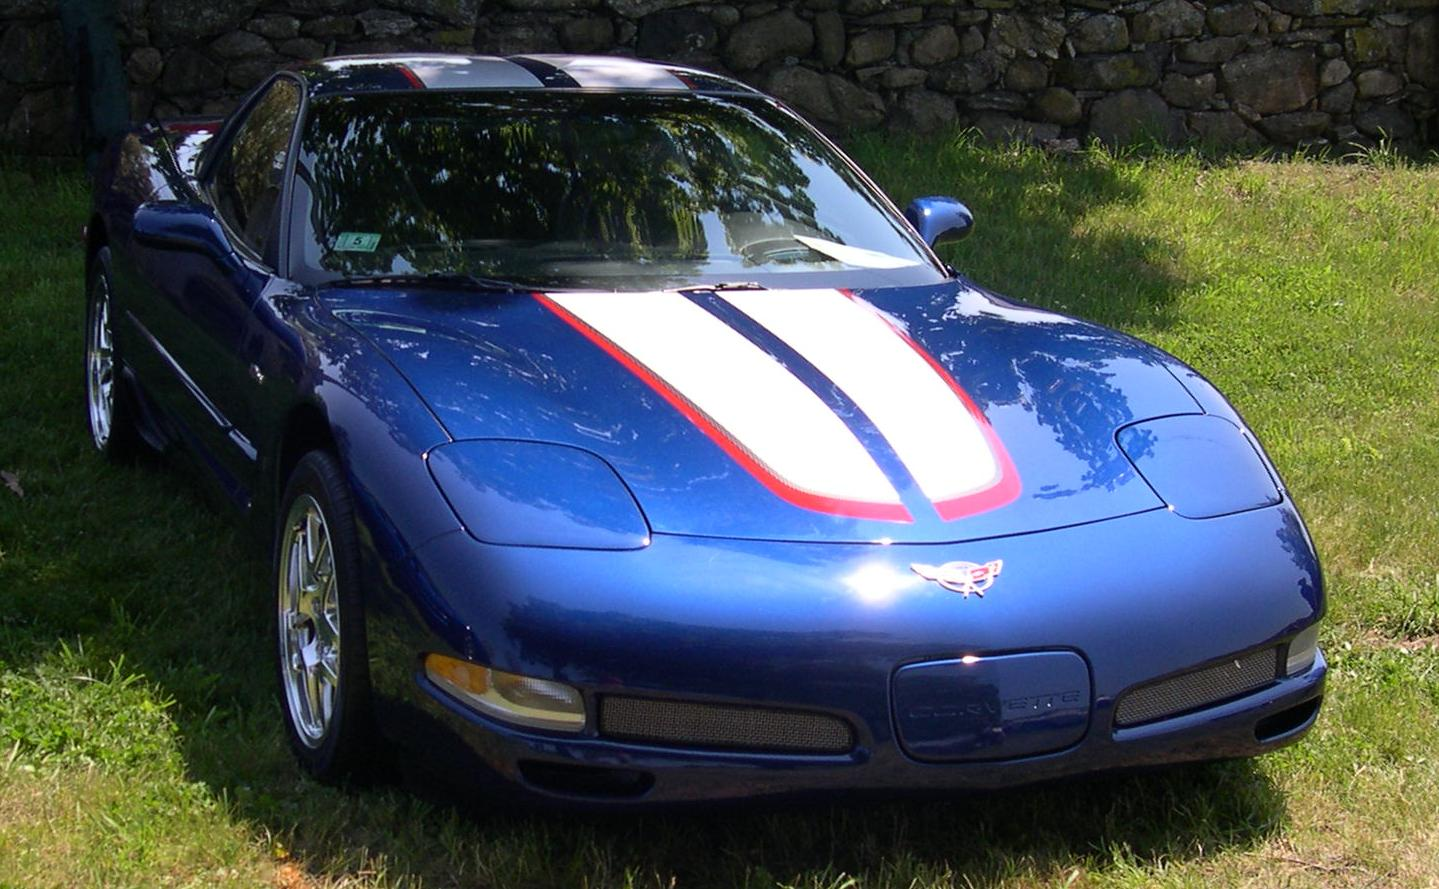 Corvette chevy corvette 2003 : Chevrolet Corvette (C5) - Wikiwand